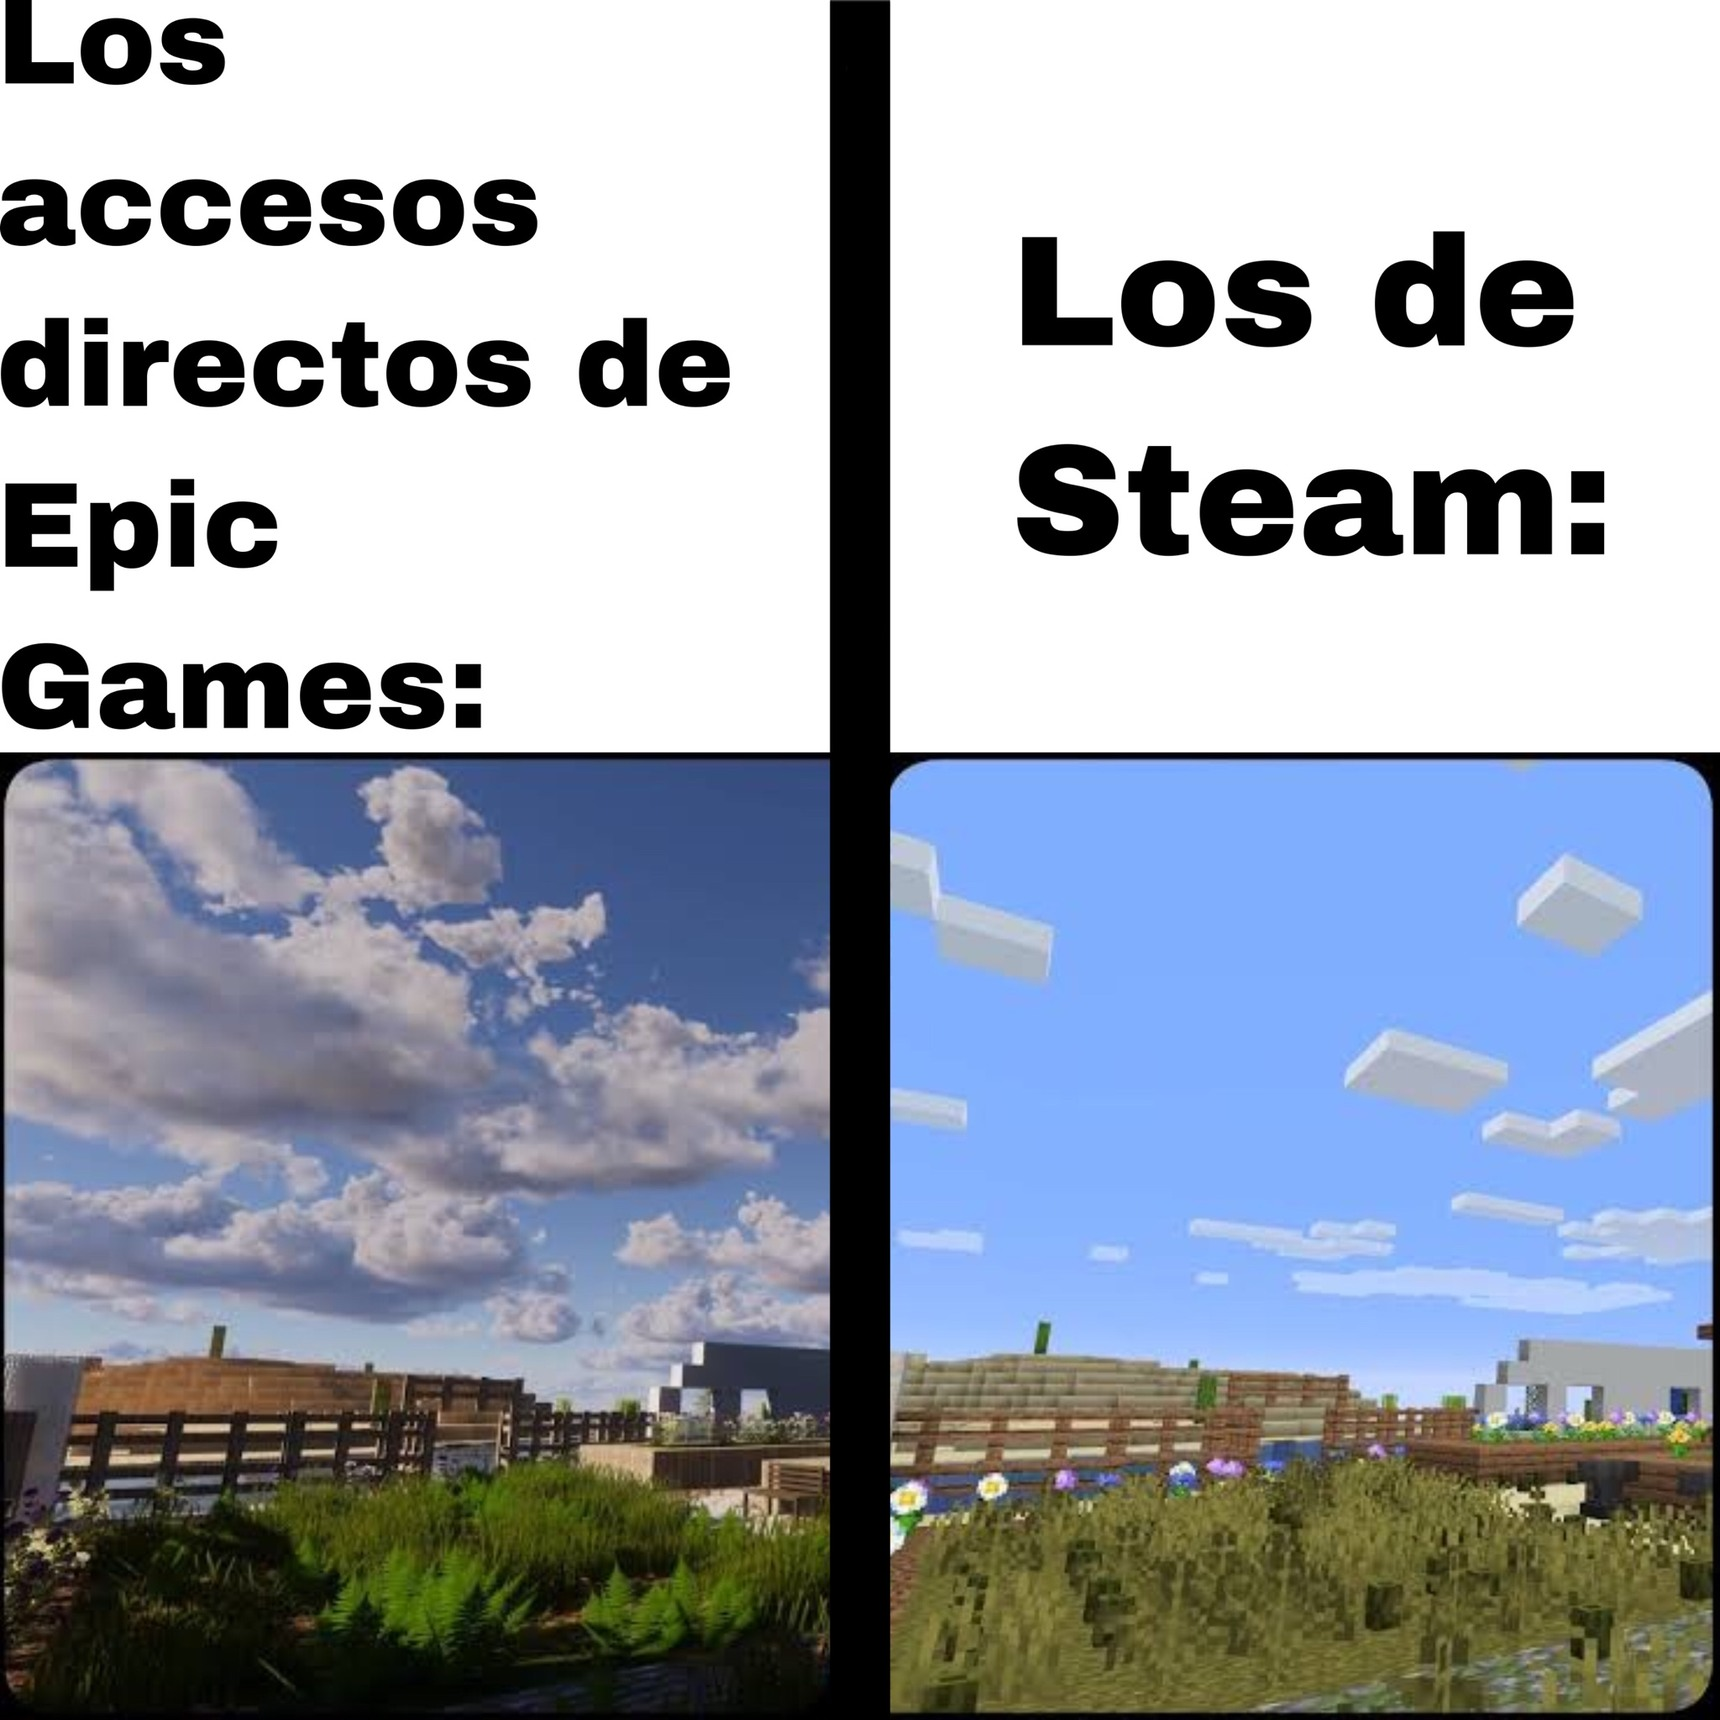 1080p-144p - meme